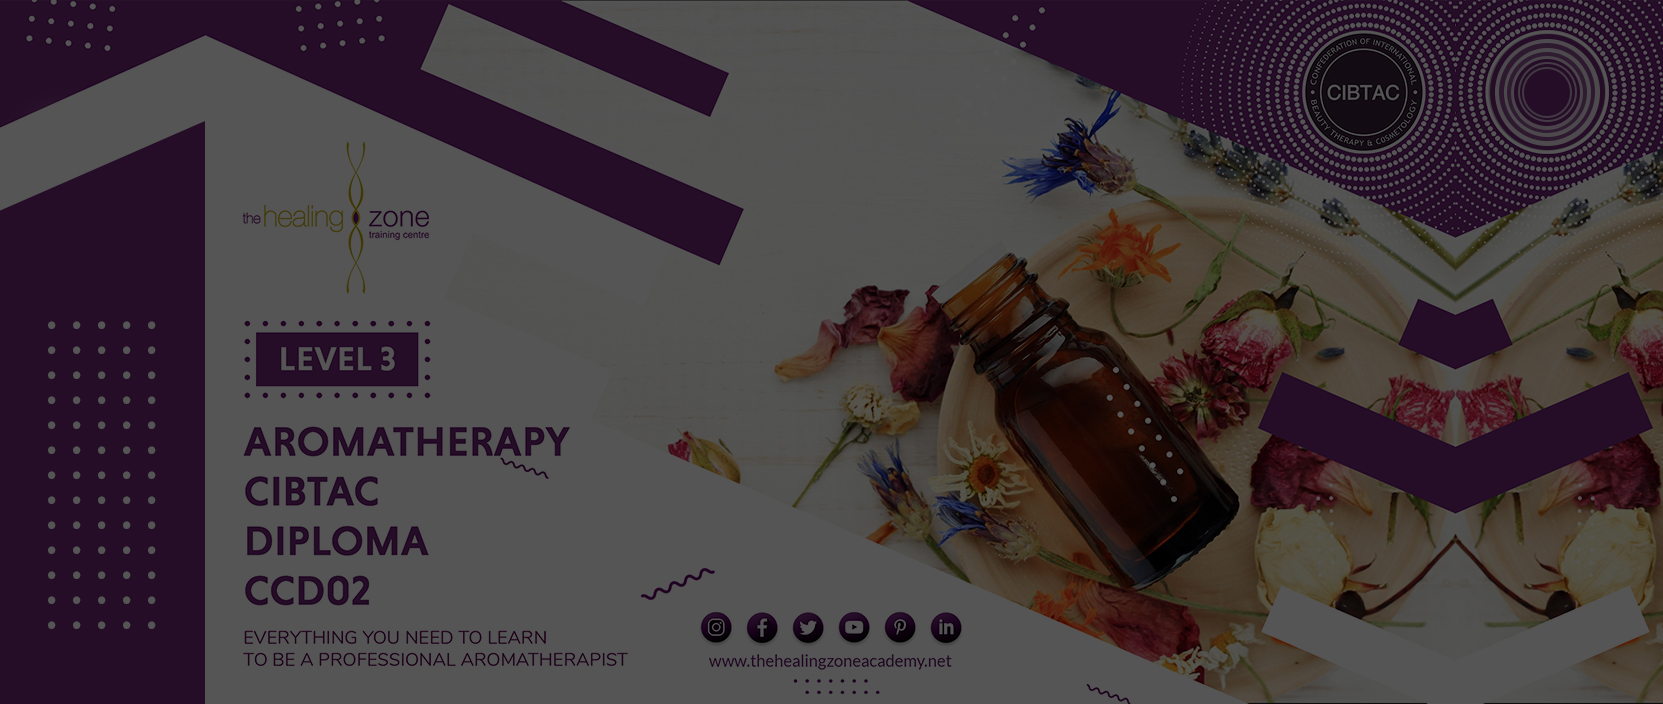 Aromatherapy CIBTAC diploma